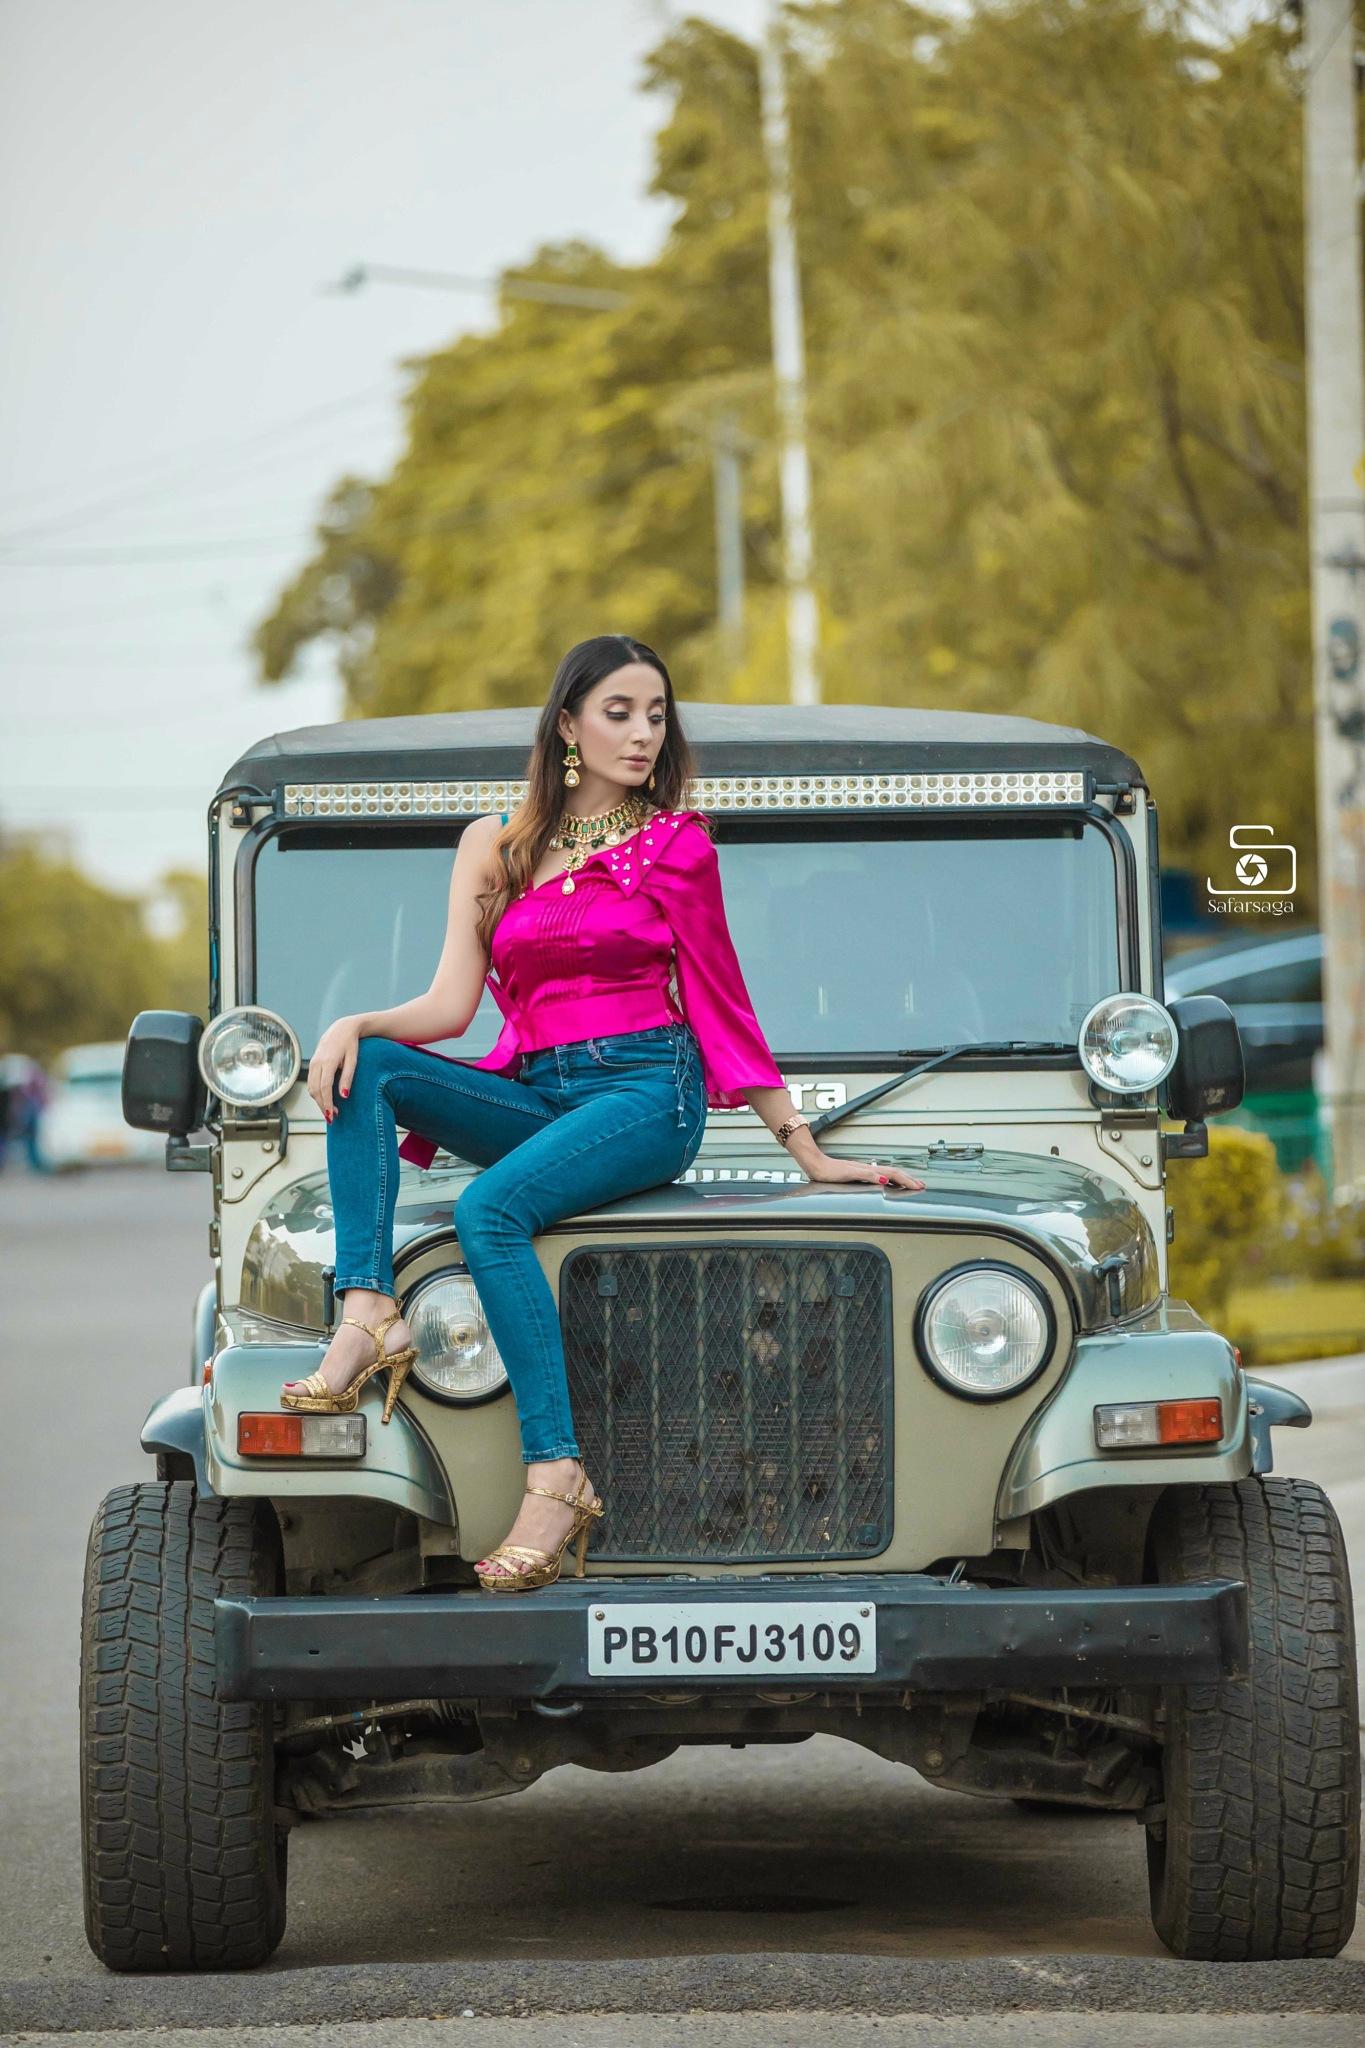 Fashion Photographer in Chandigarh by Safarsaga Films